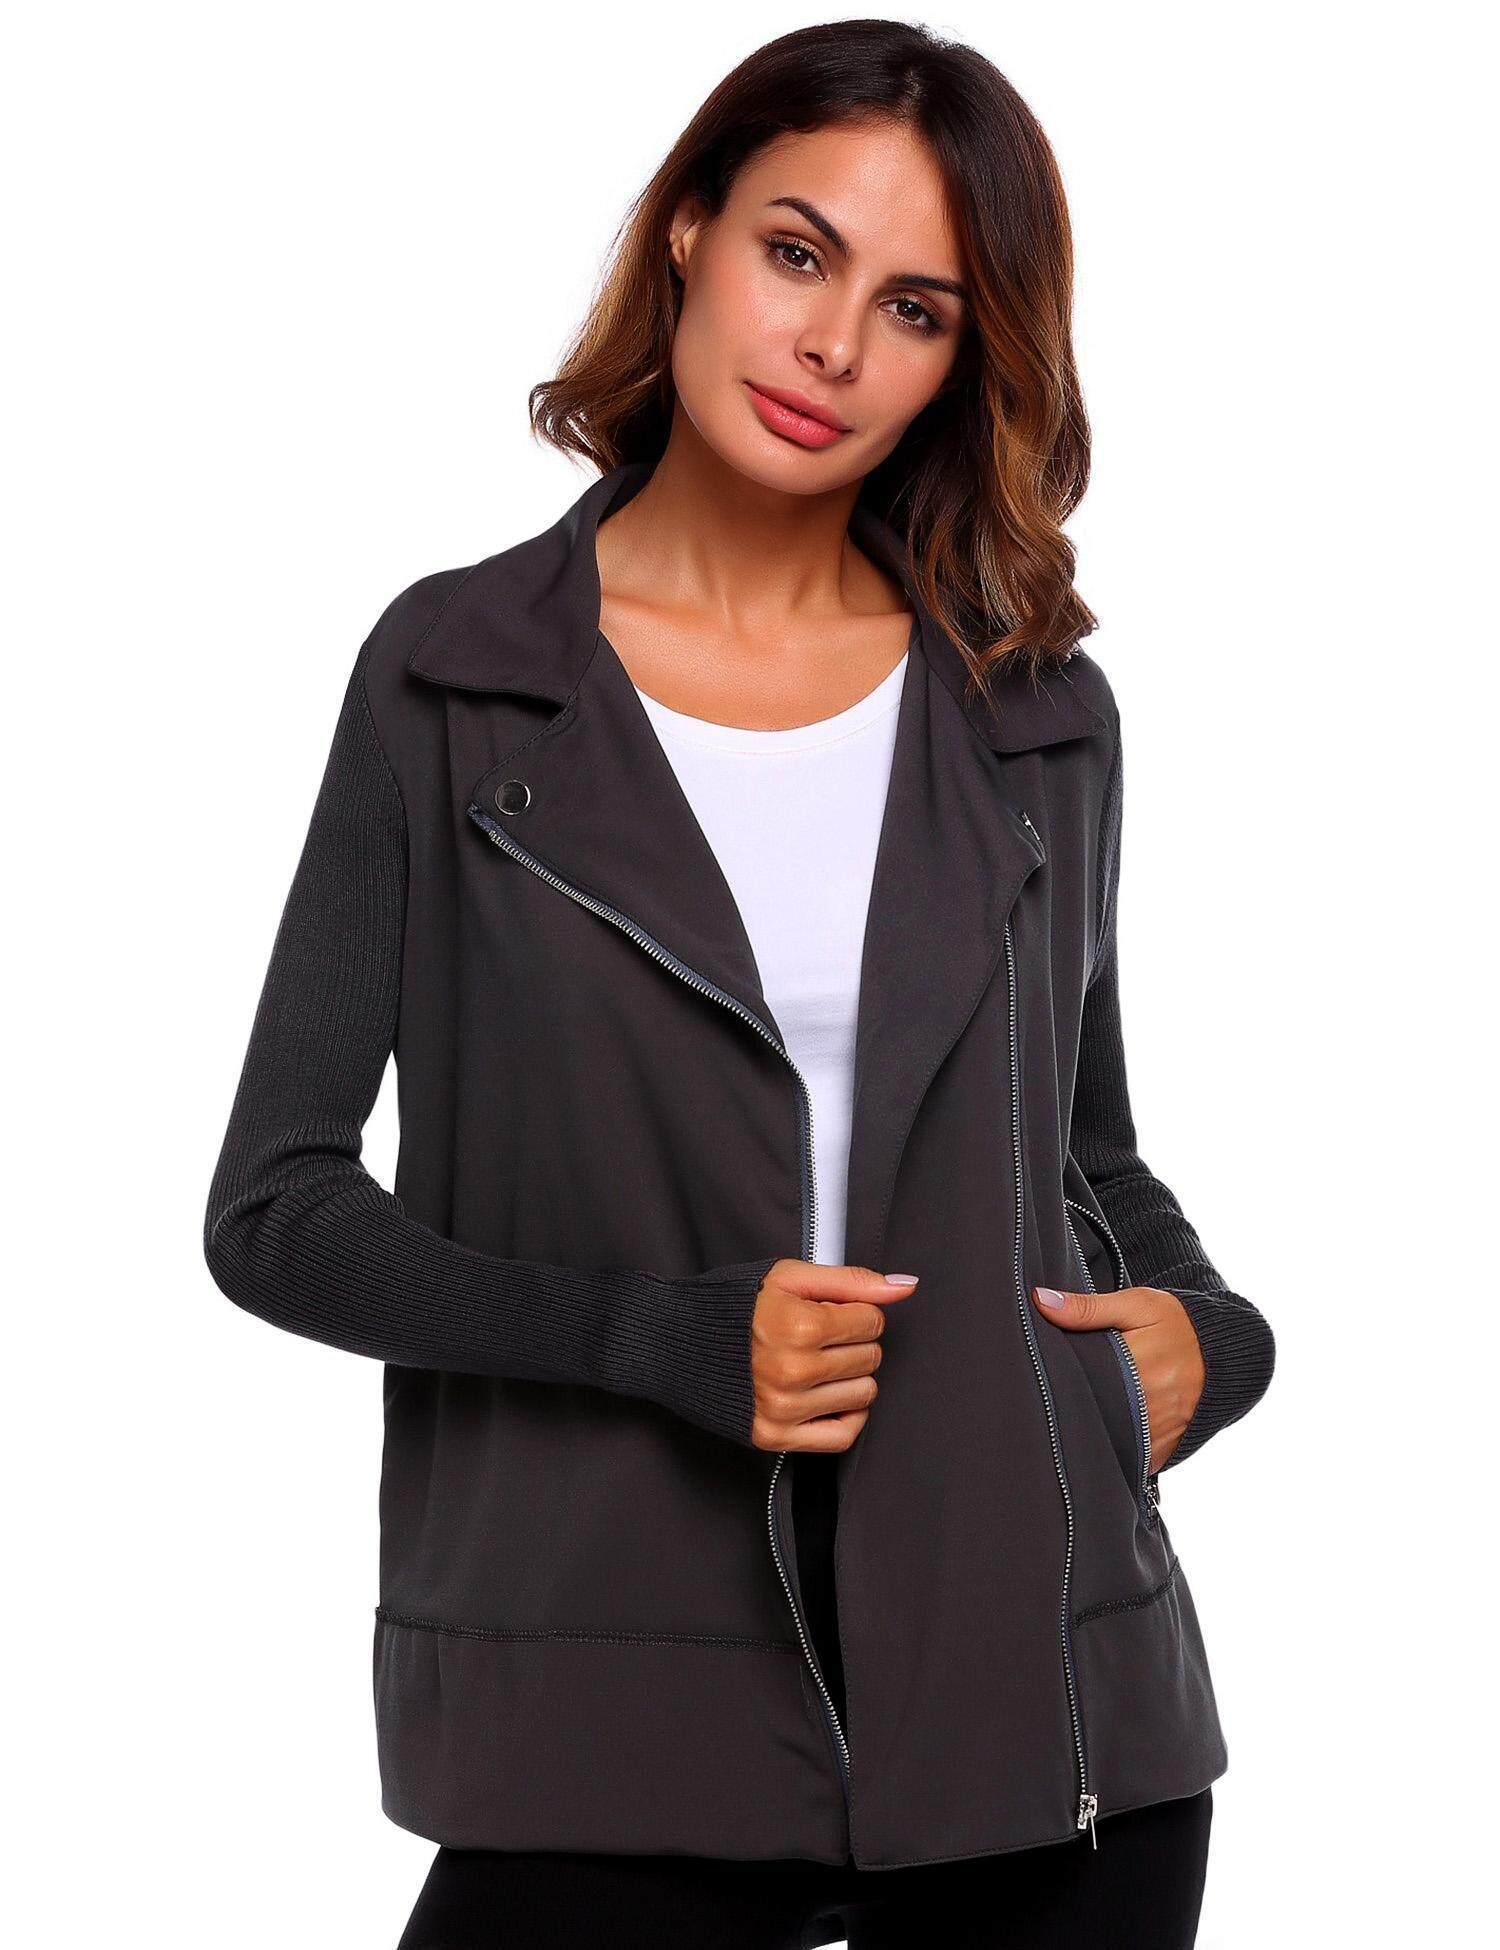 Toprank Women Hoodie Long Sleeve Warm Relaxed Fit Zipper Patchwork Knit Jackets ( Grey ) - intl